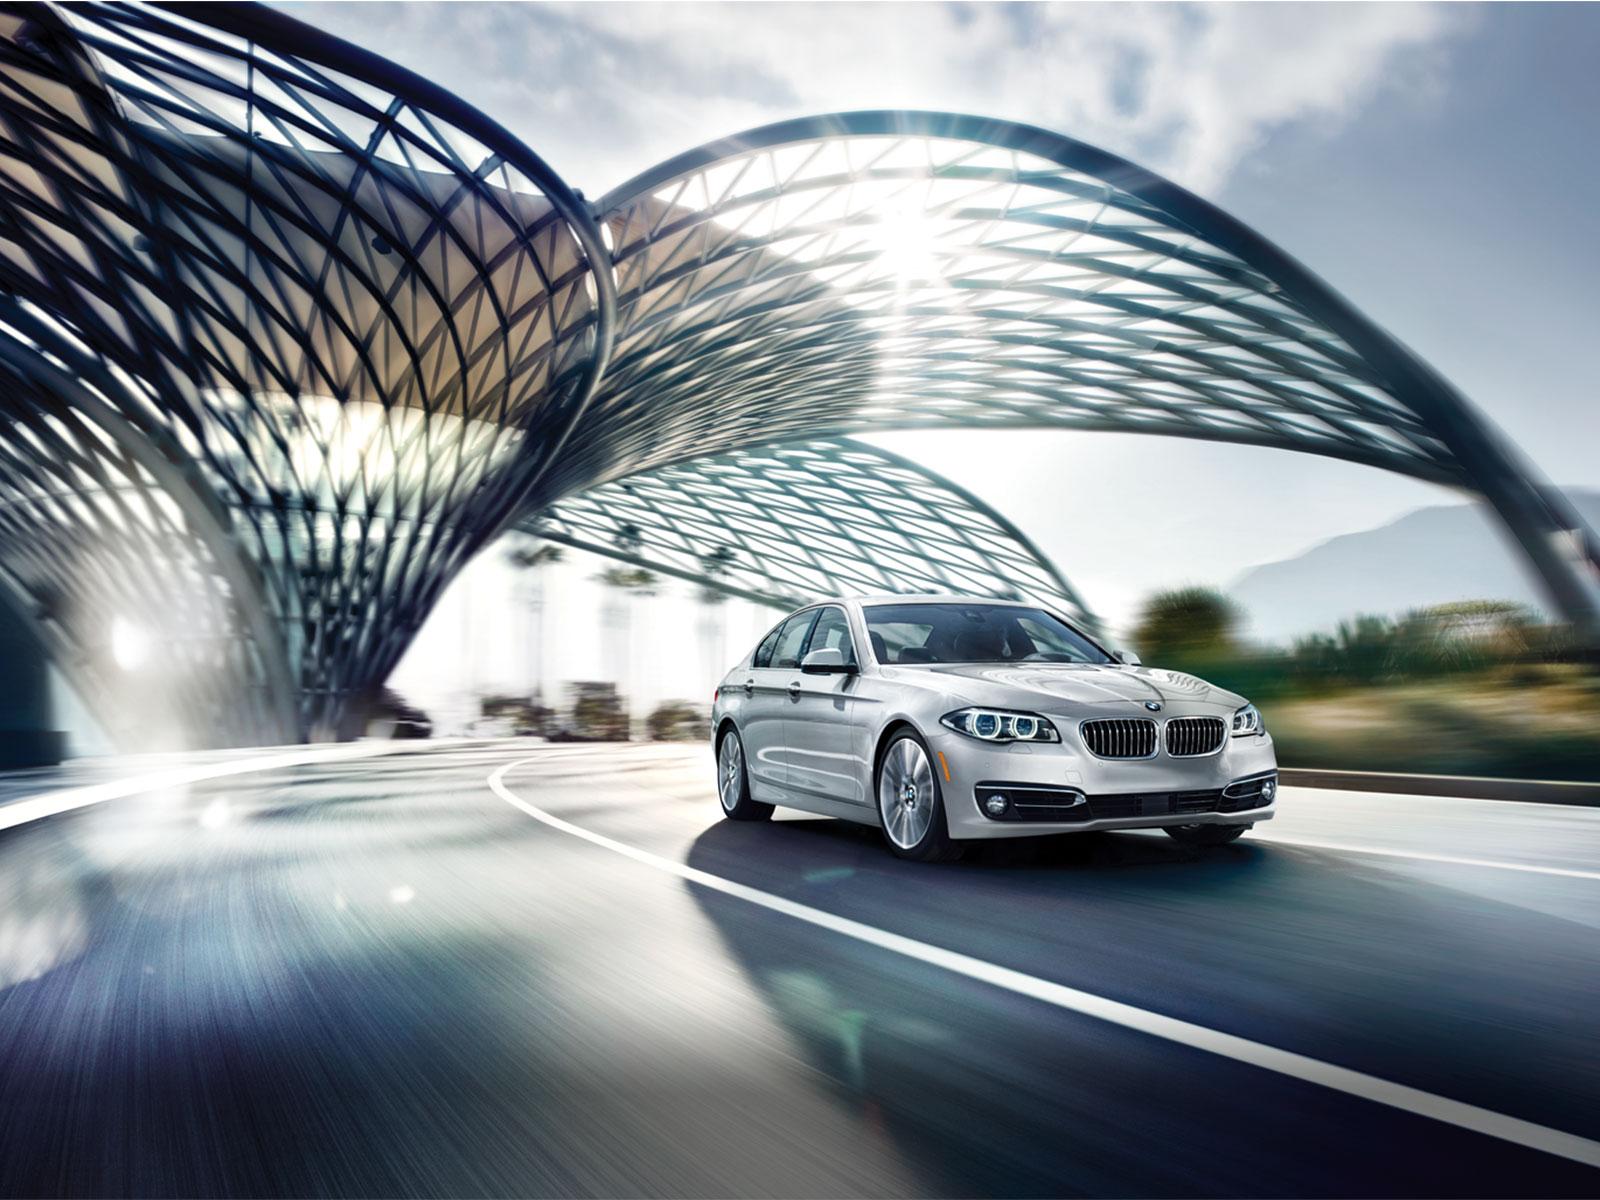 2015 BMW 528i Luxury Line (Source: bmwusa.com)